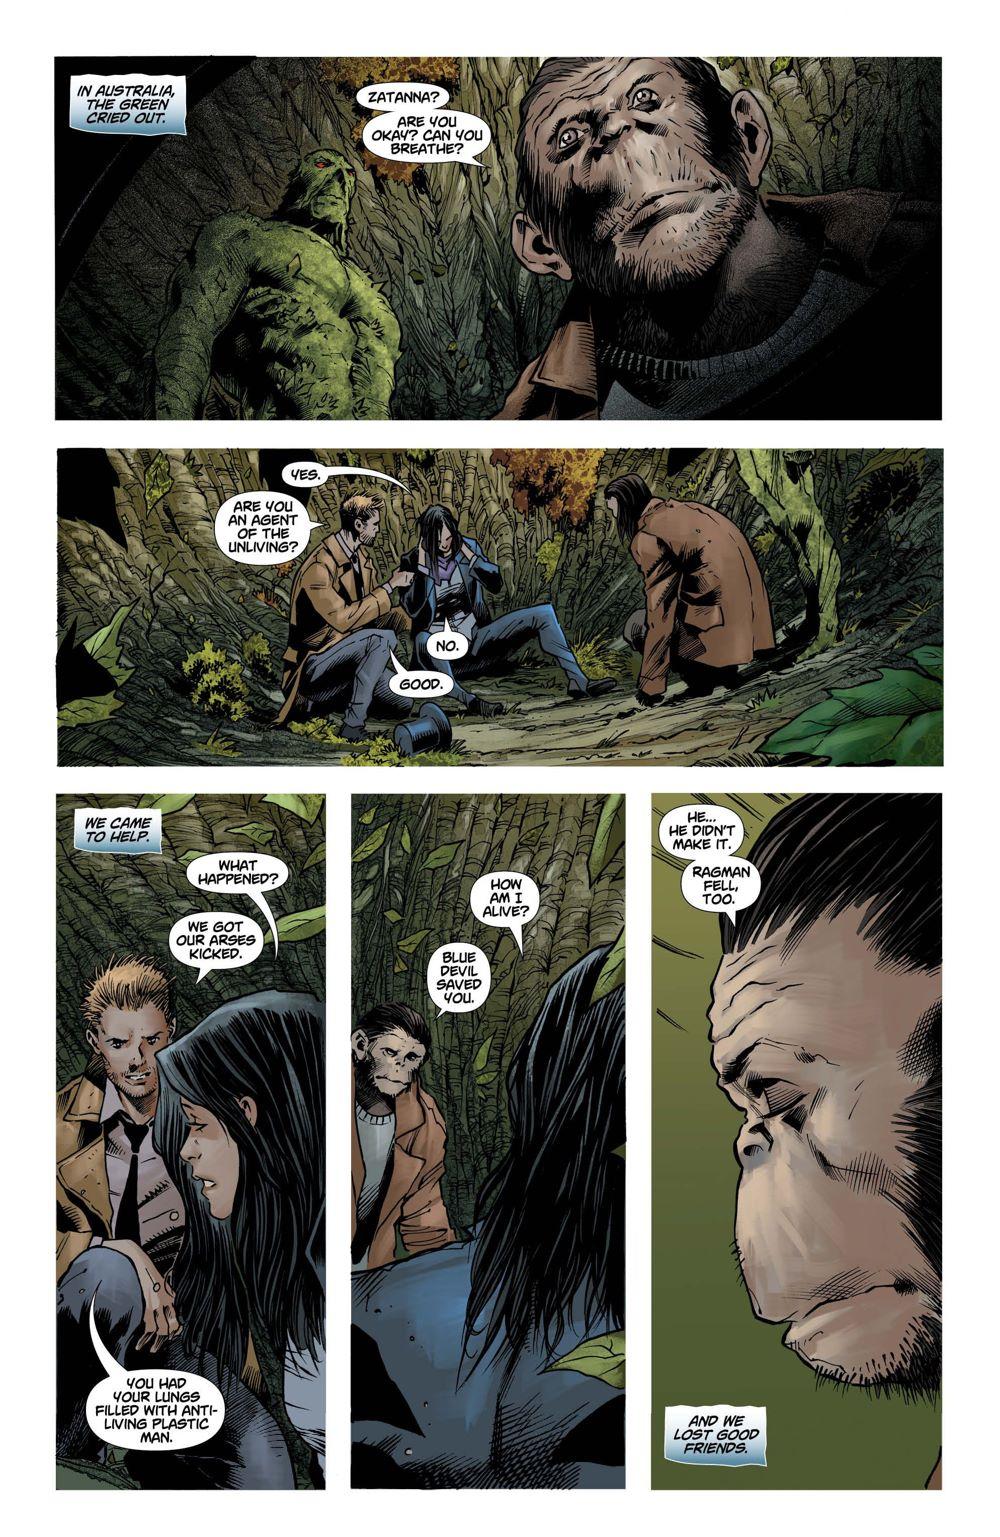 DCEASEDDP-3-1 ComicList Previews: DCEASED DEAD PLANET #3